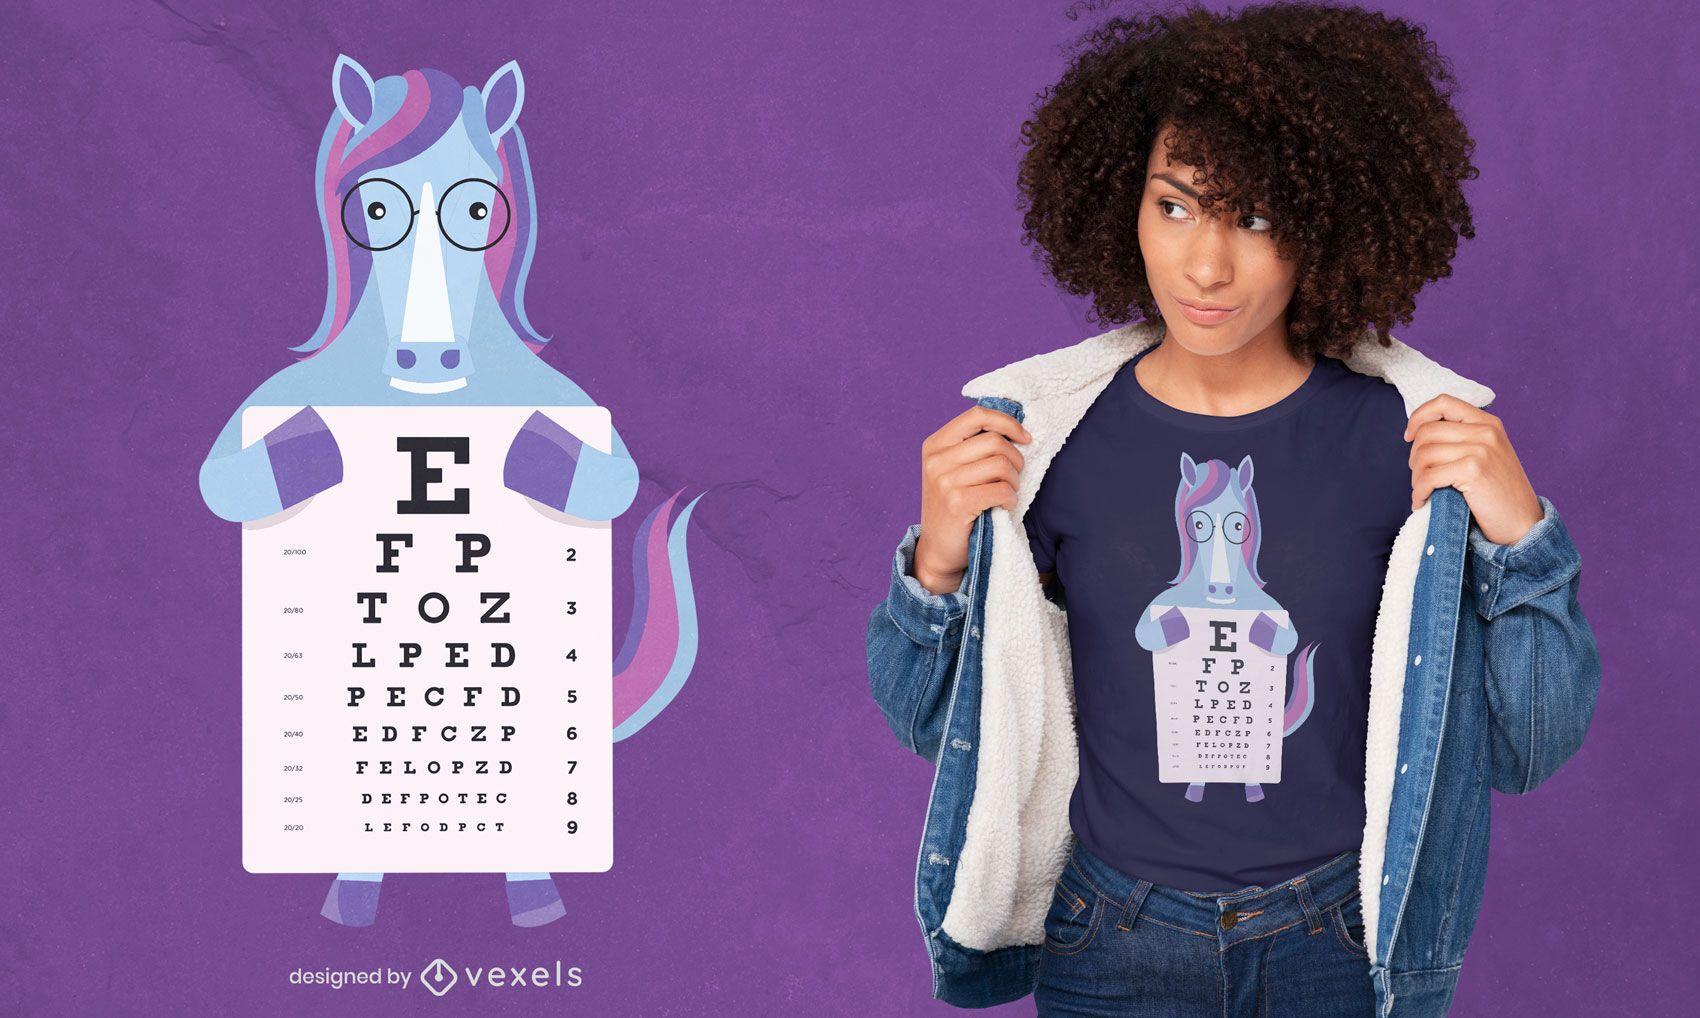 Diseño de camiseta de gráfico de ojos de unicornio